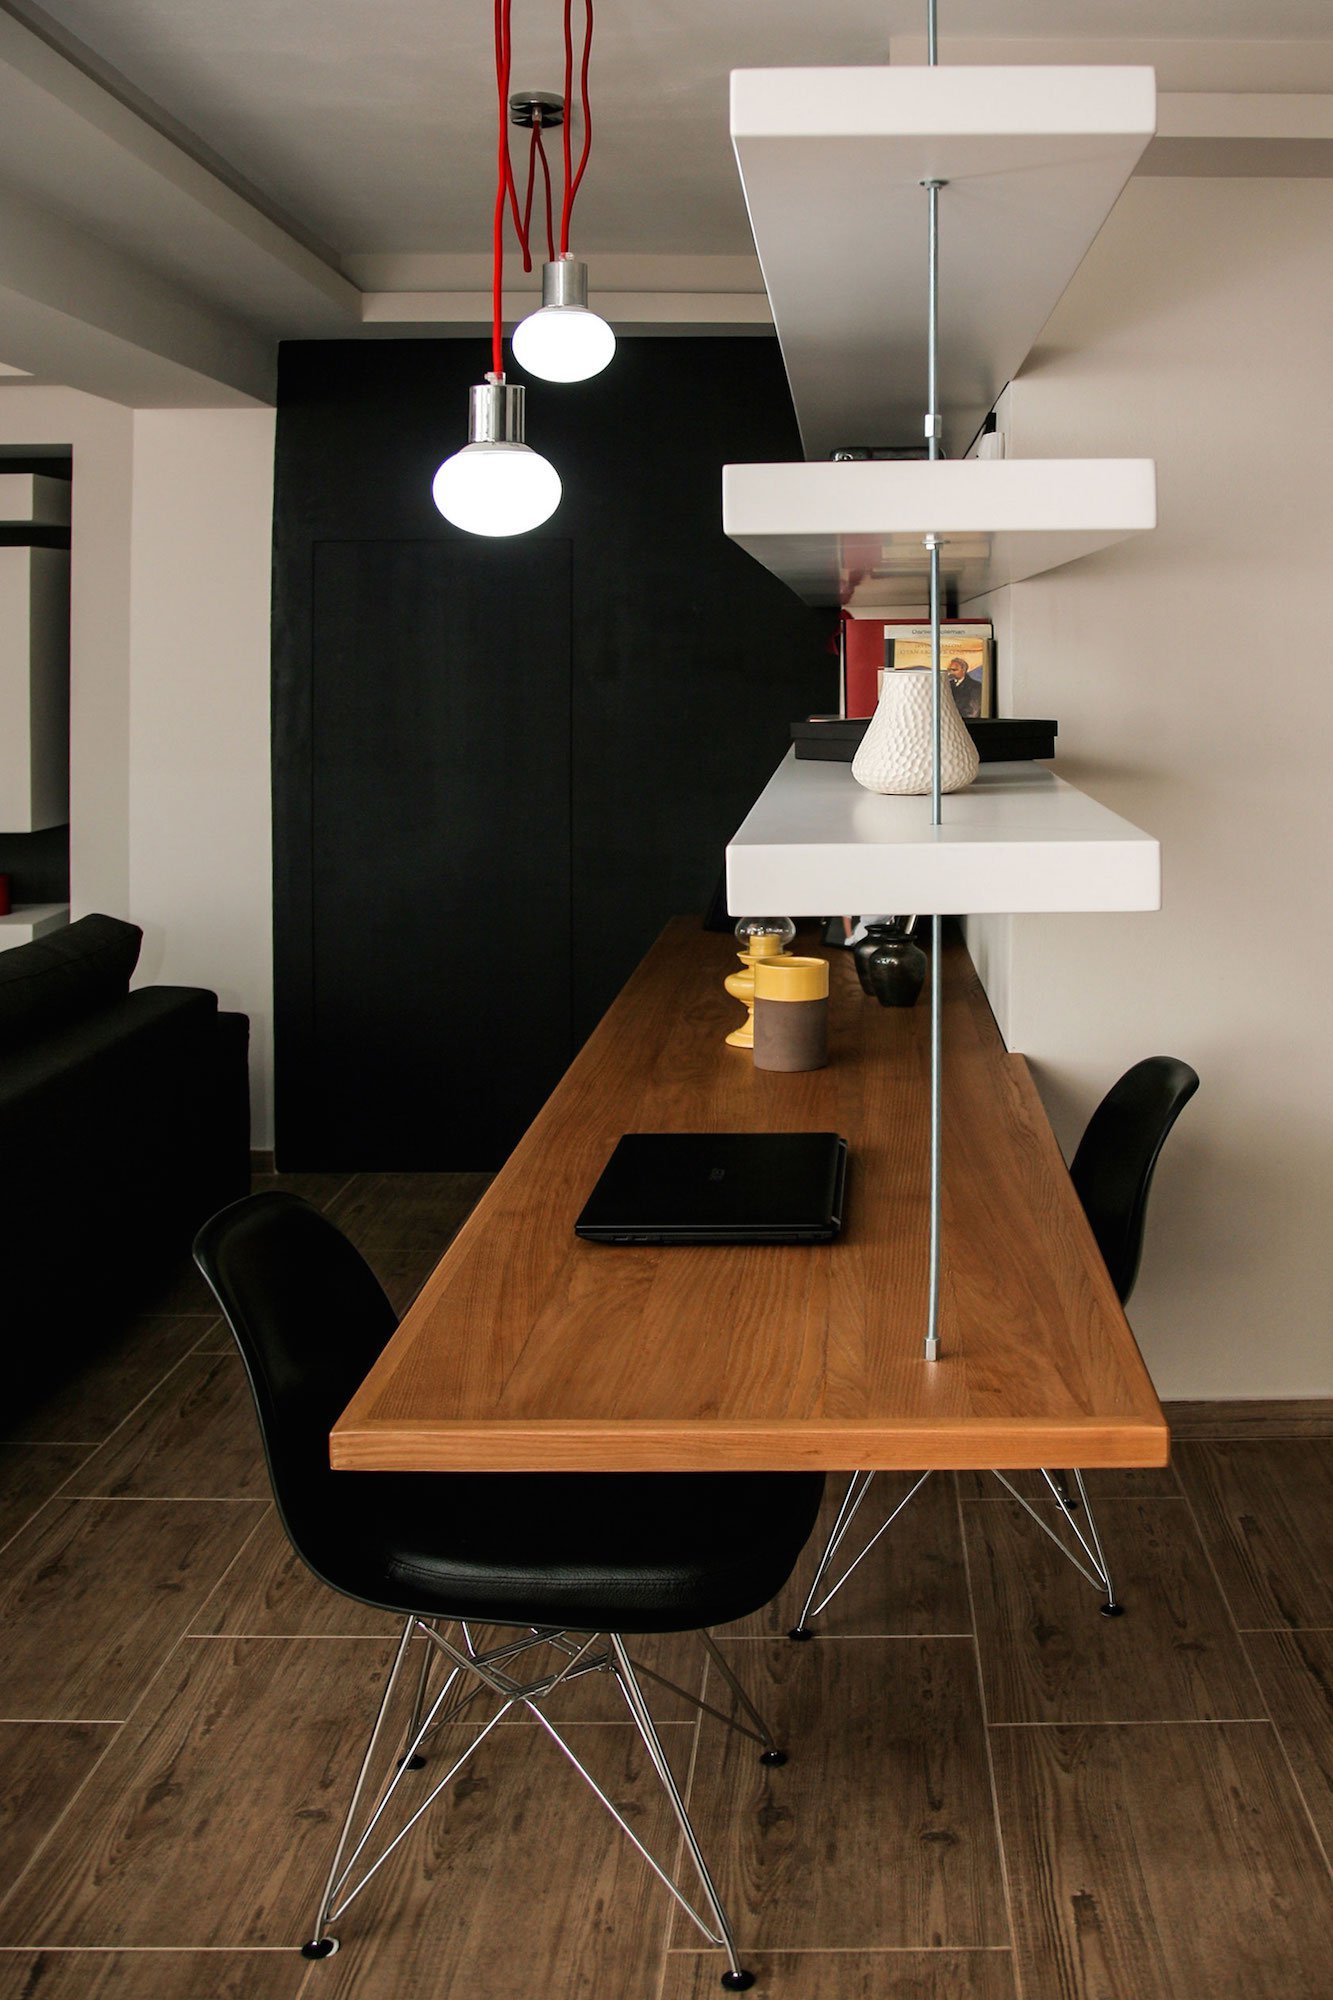 A-Stylish-Apartment-in-Heraklion-04